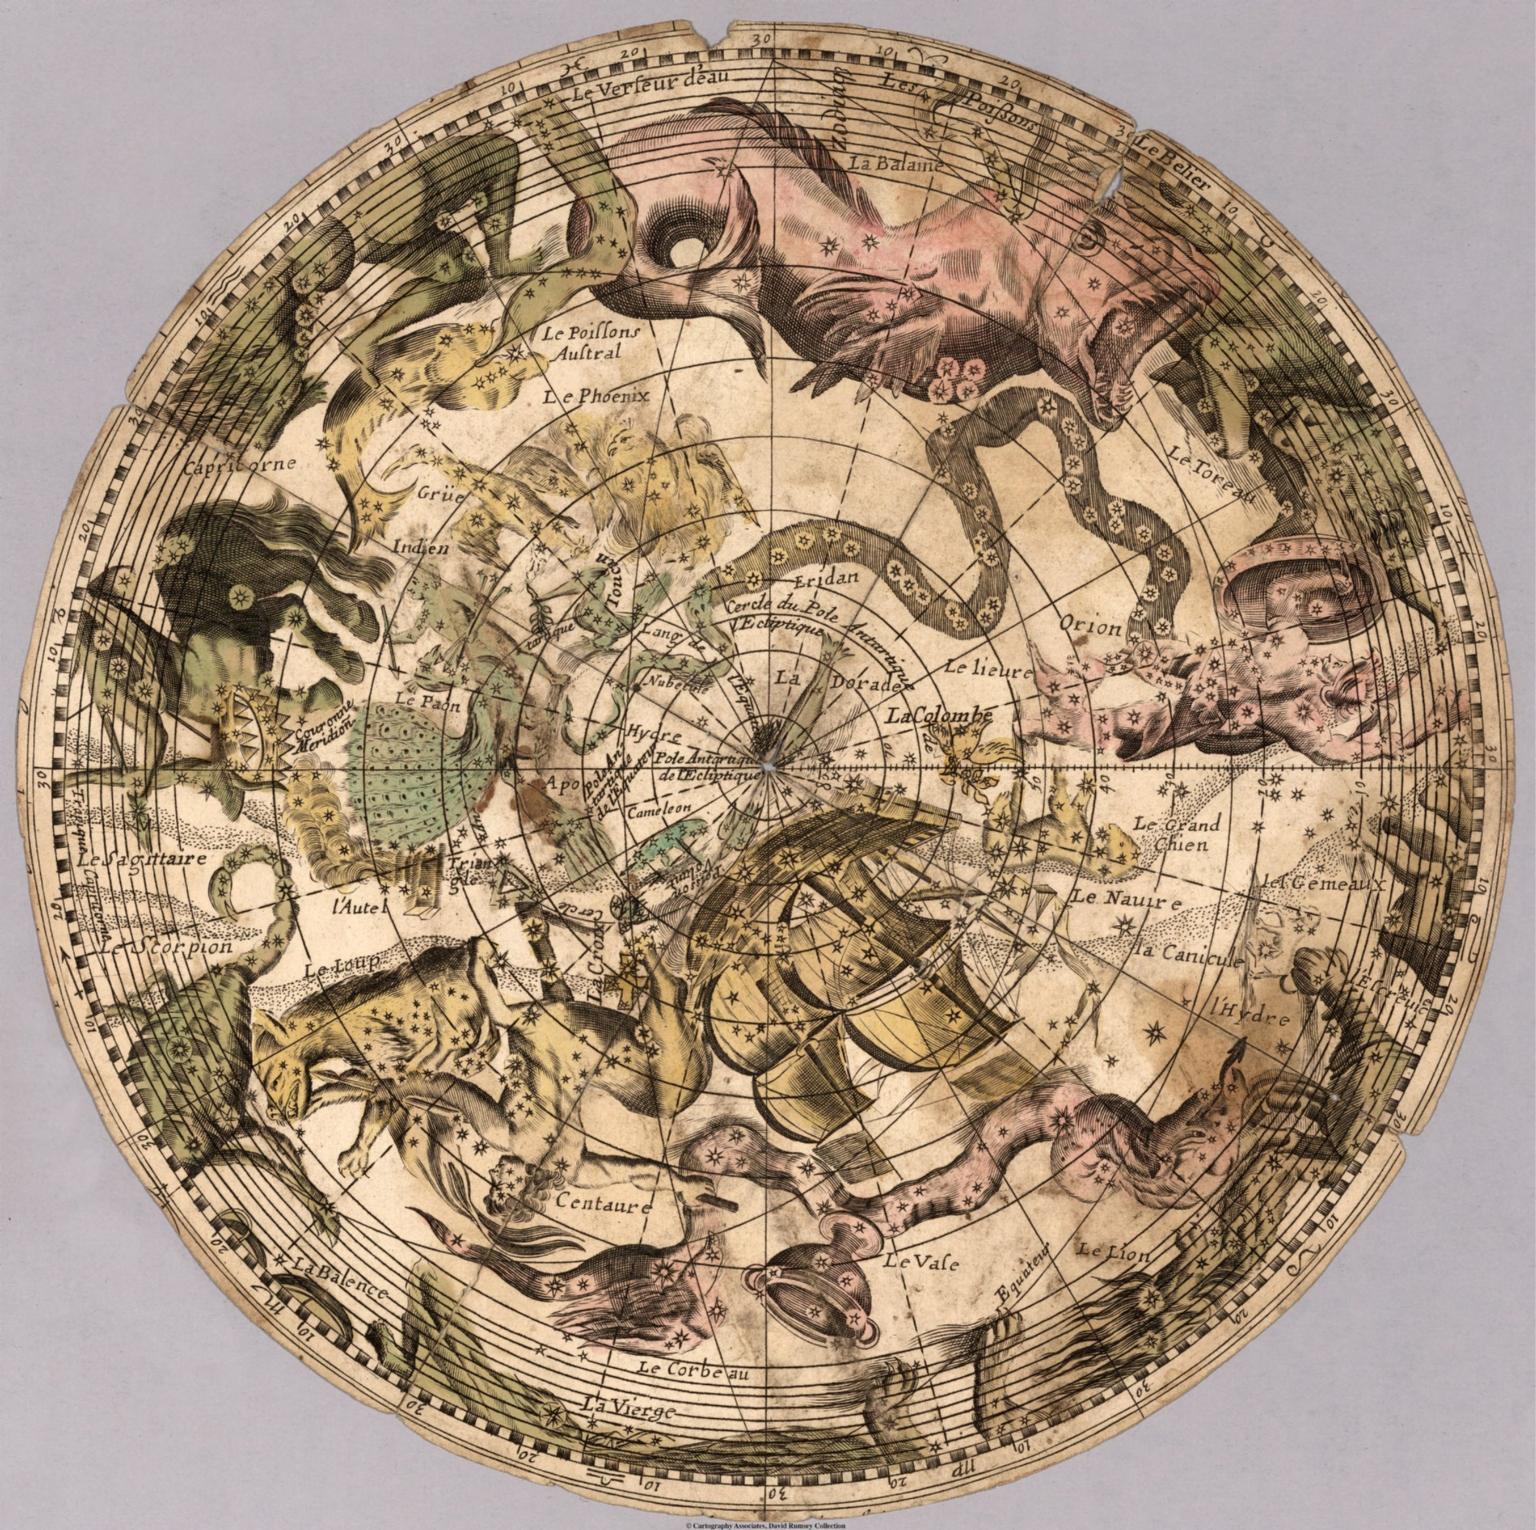 Circular planisphere